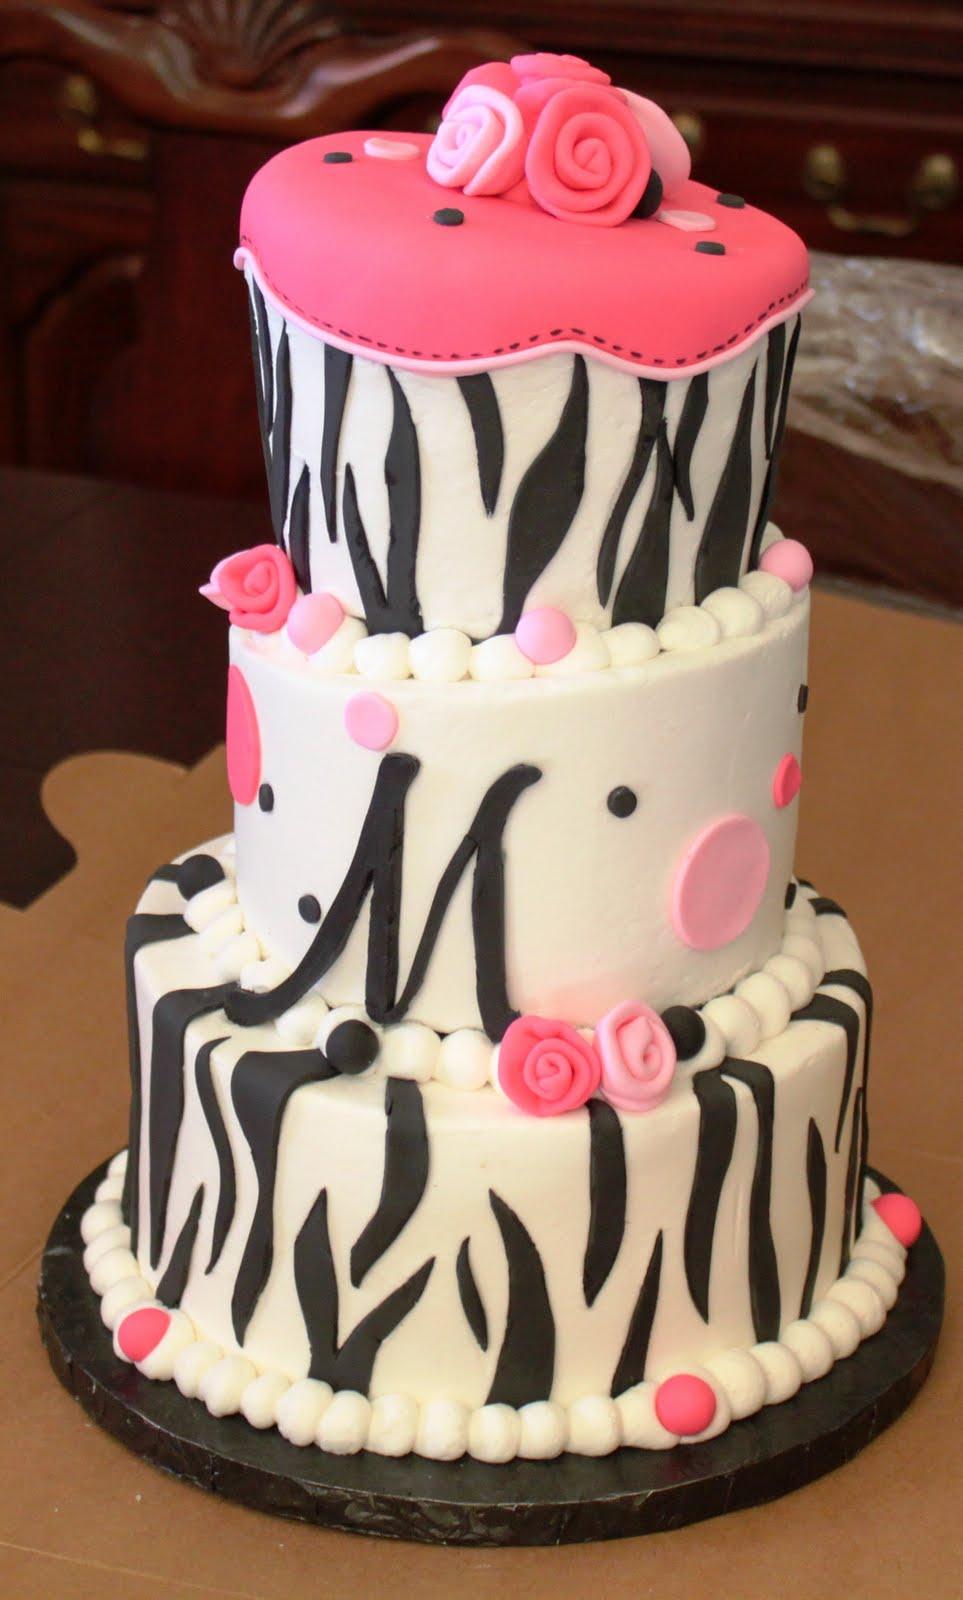 Its A Toni Cake March 2010